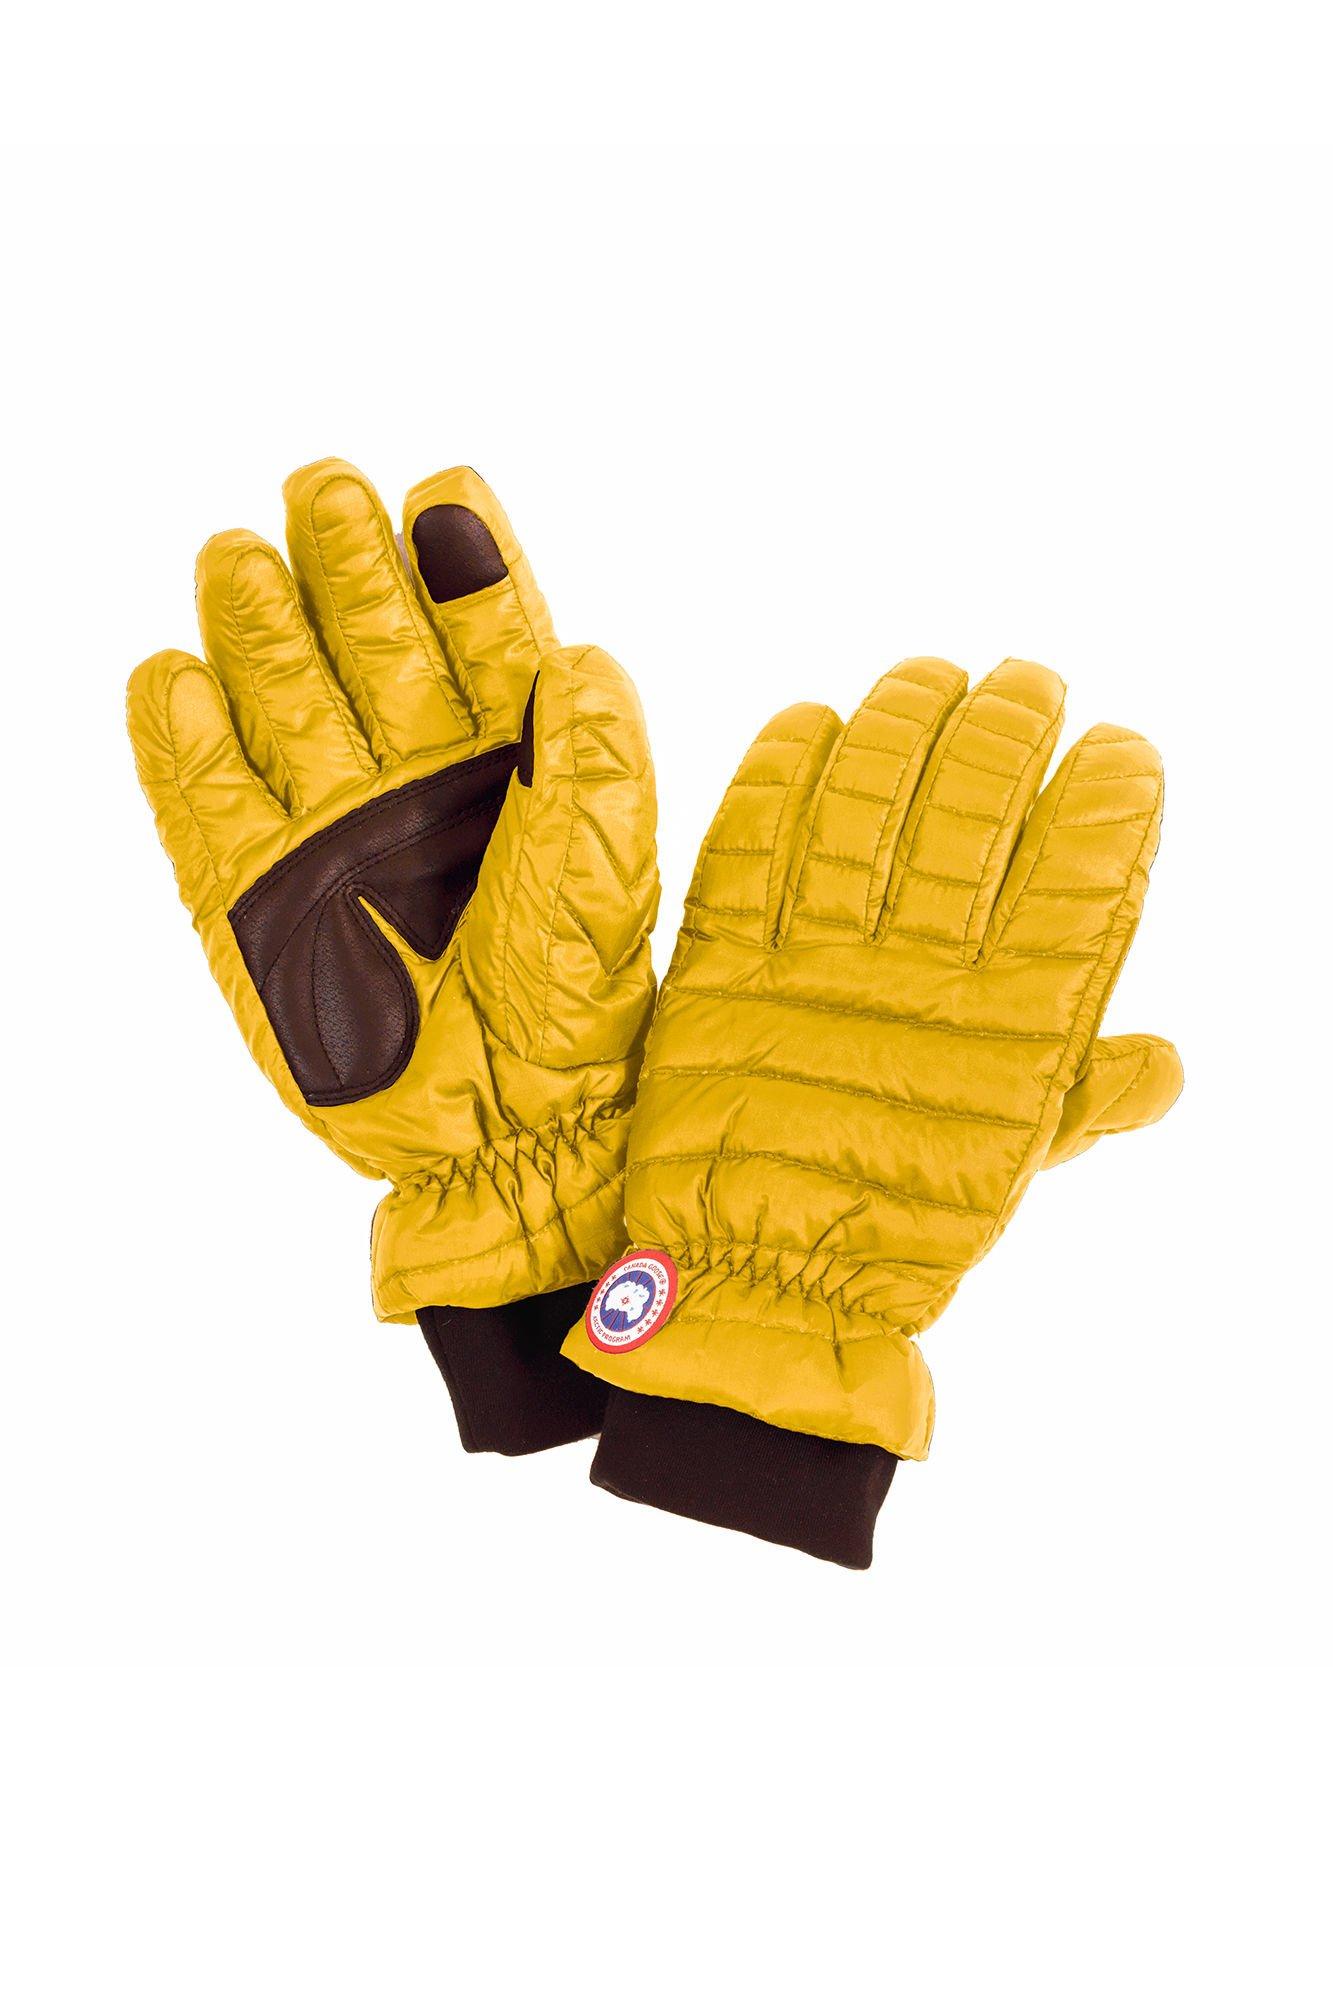 Canada Goose' Women's Arctic Down Glove